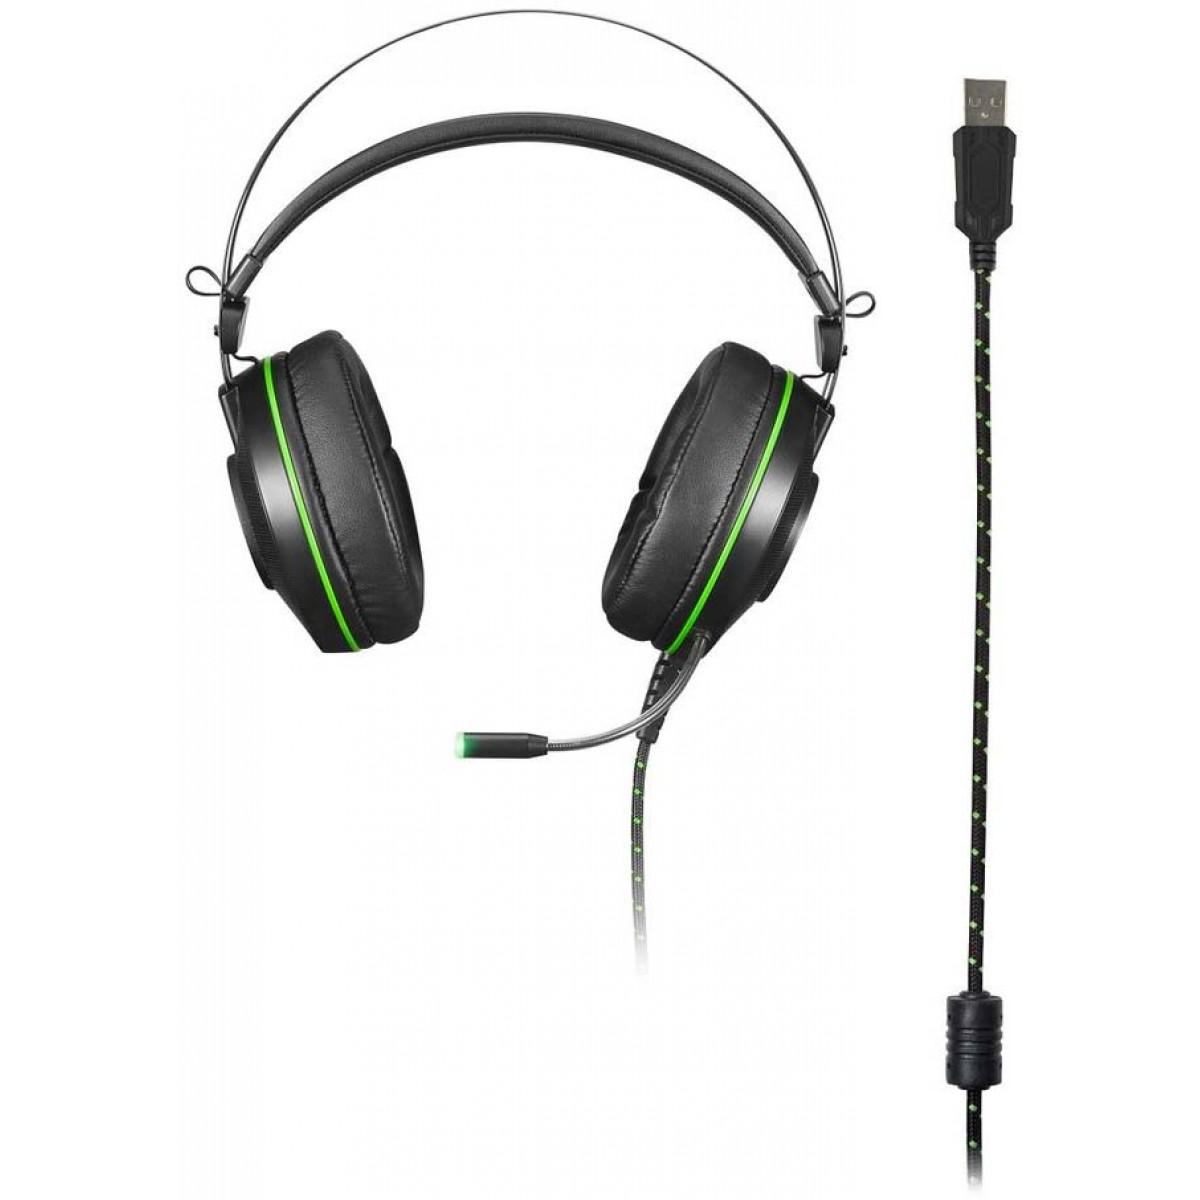 Headset Gamer Warrior Raiko USB 7.1 3D Digital Surround, Preto, PH259